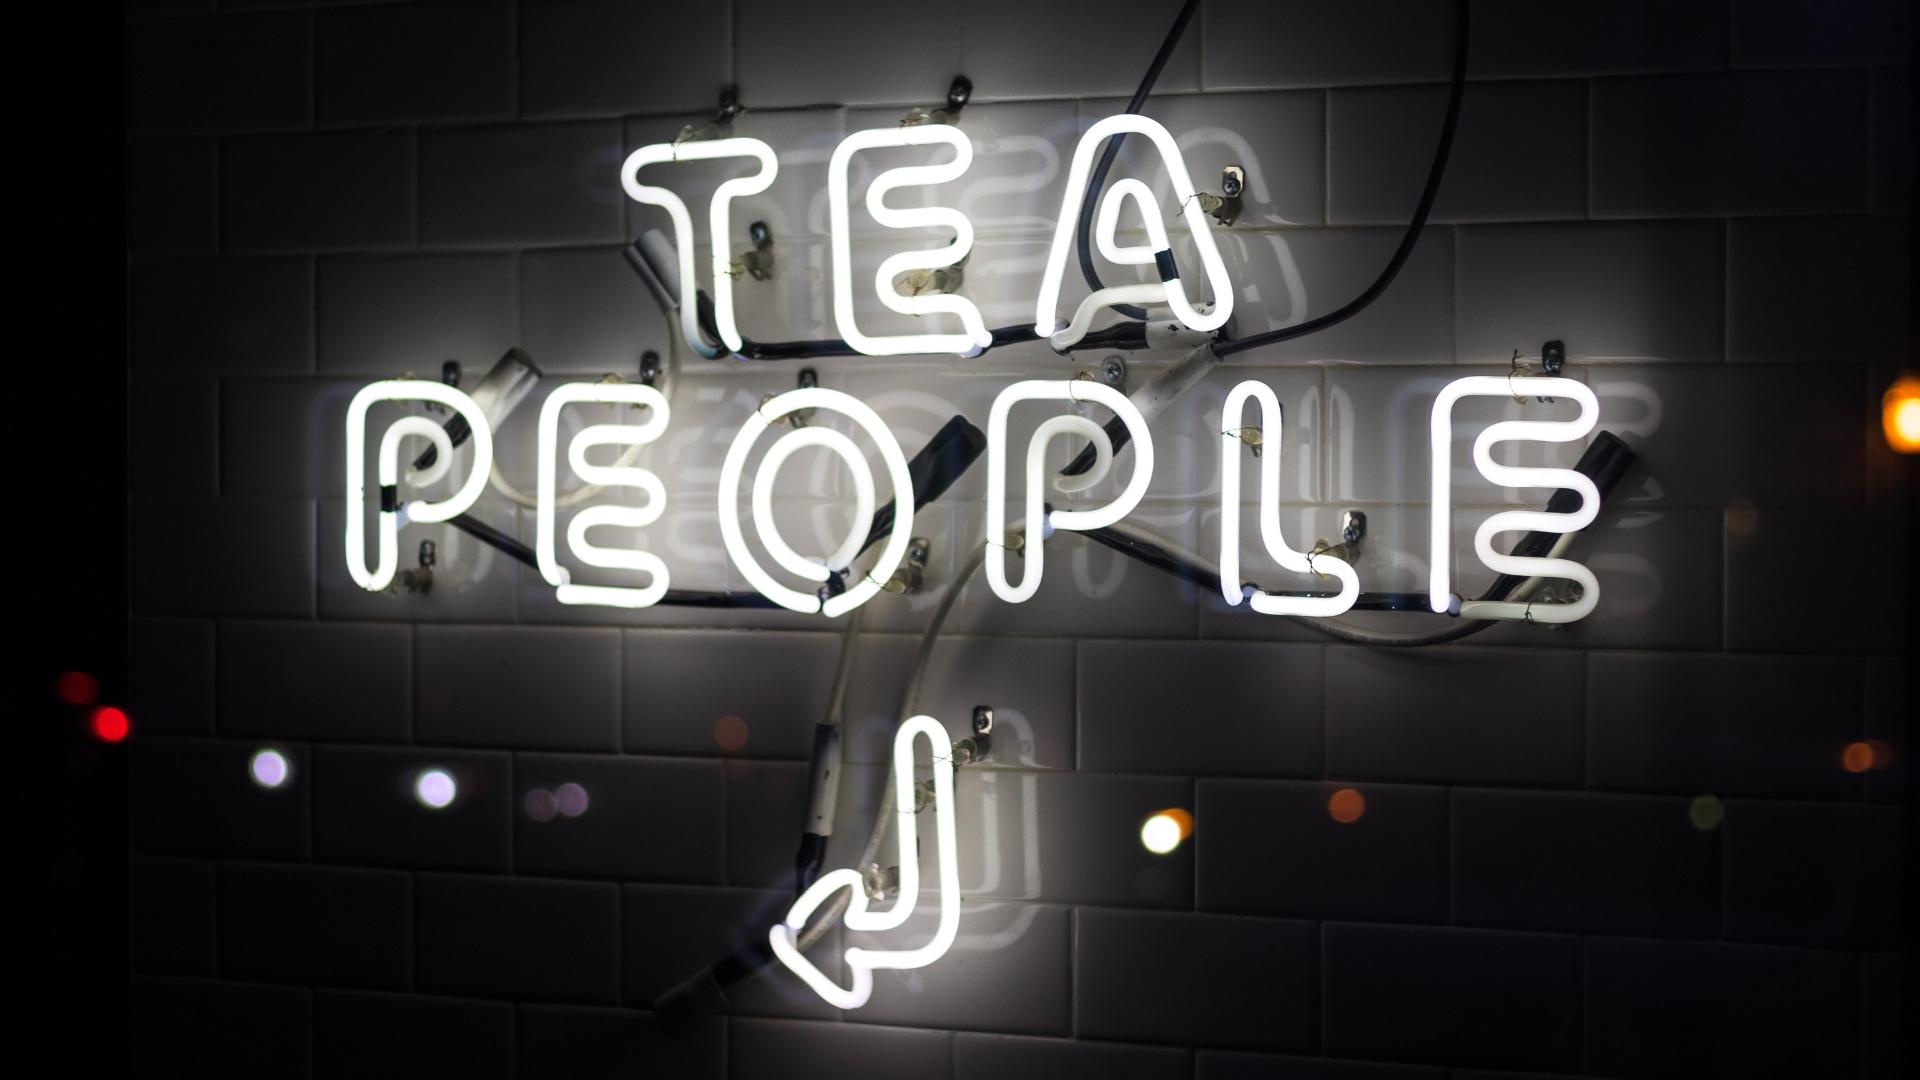 banner-lines-to-love-tea-or-coffee-06.jpg